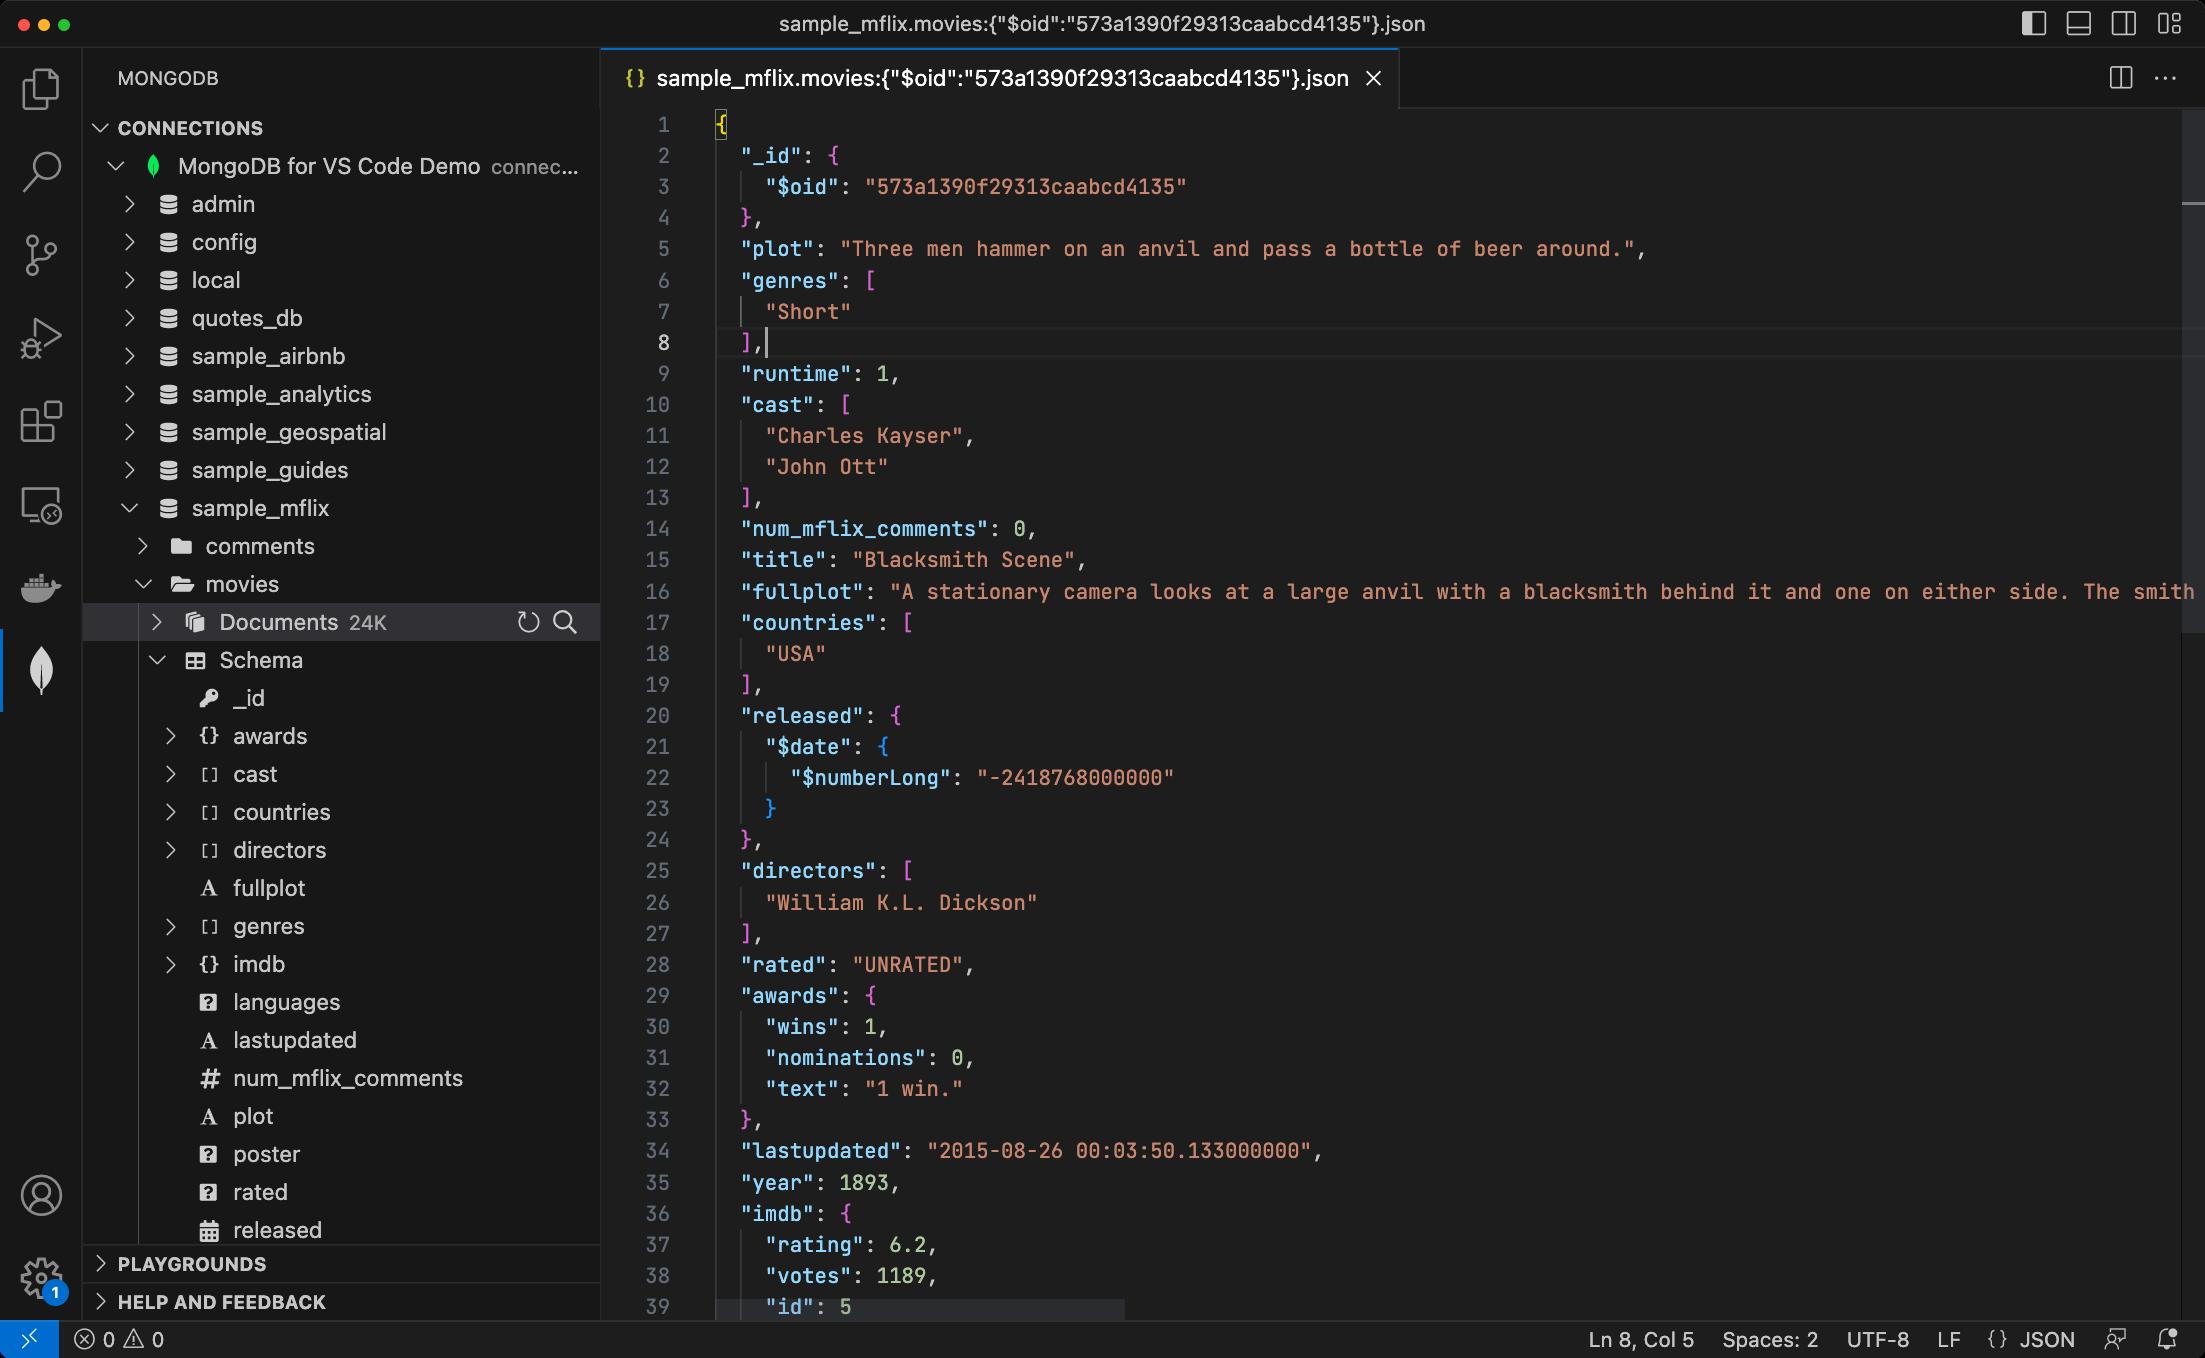 Explore data with MongoDB for VS Code